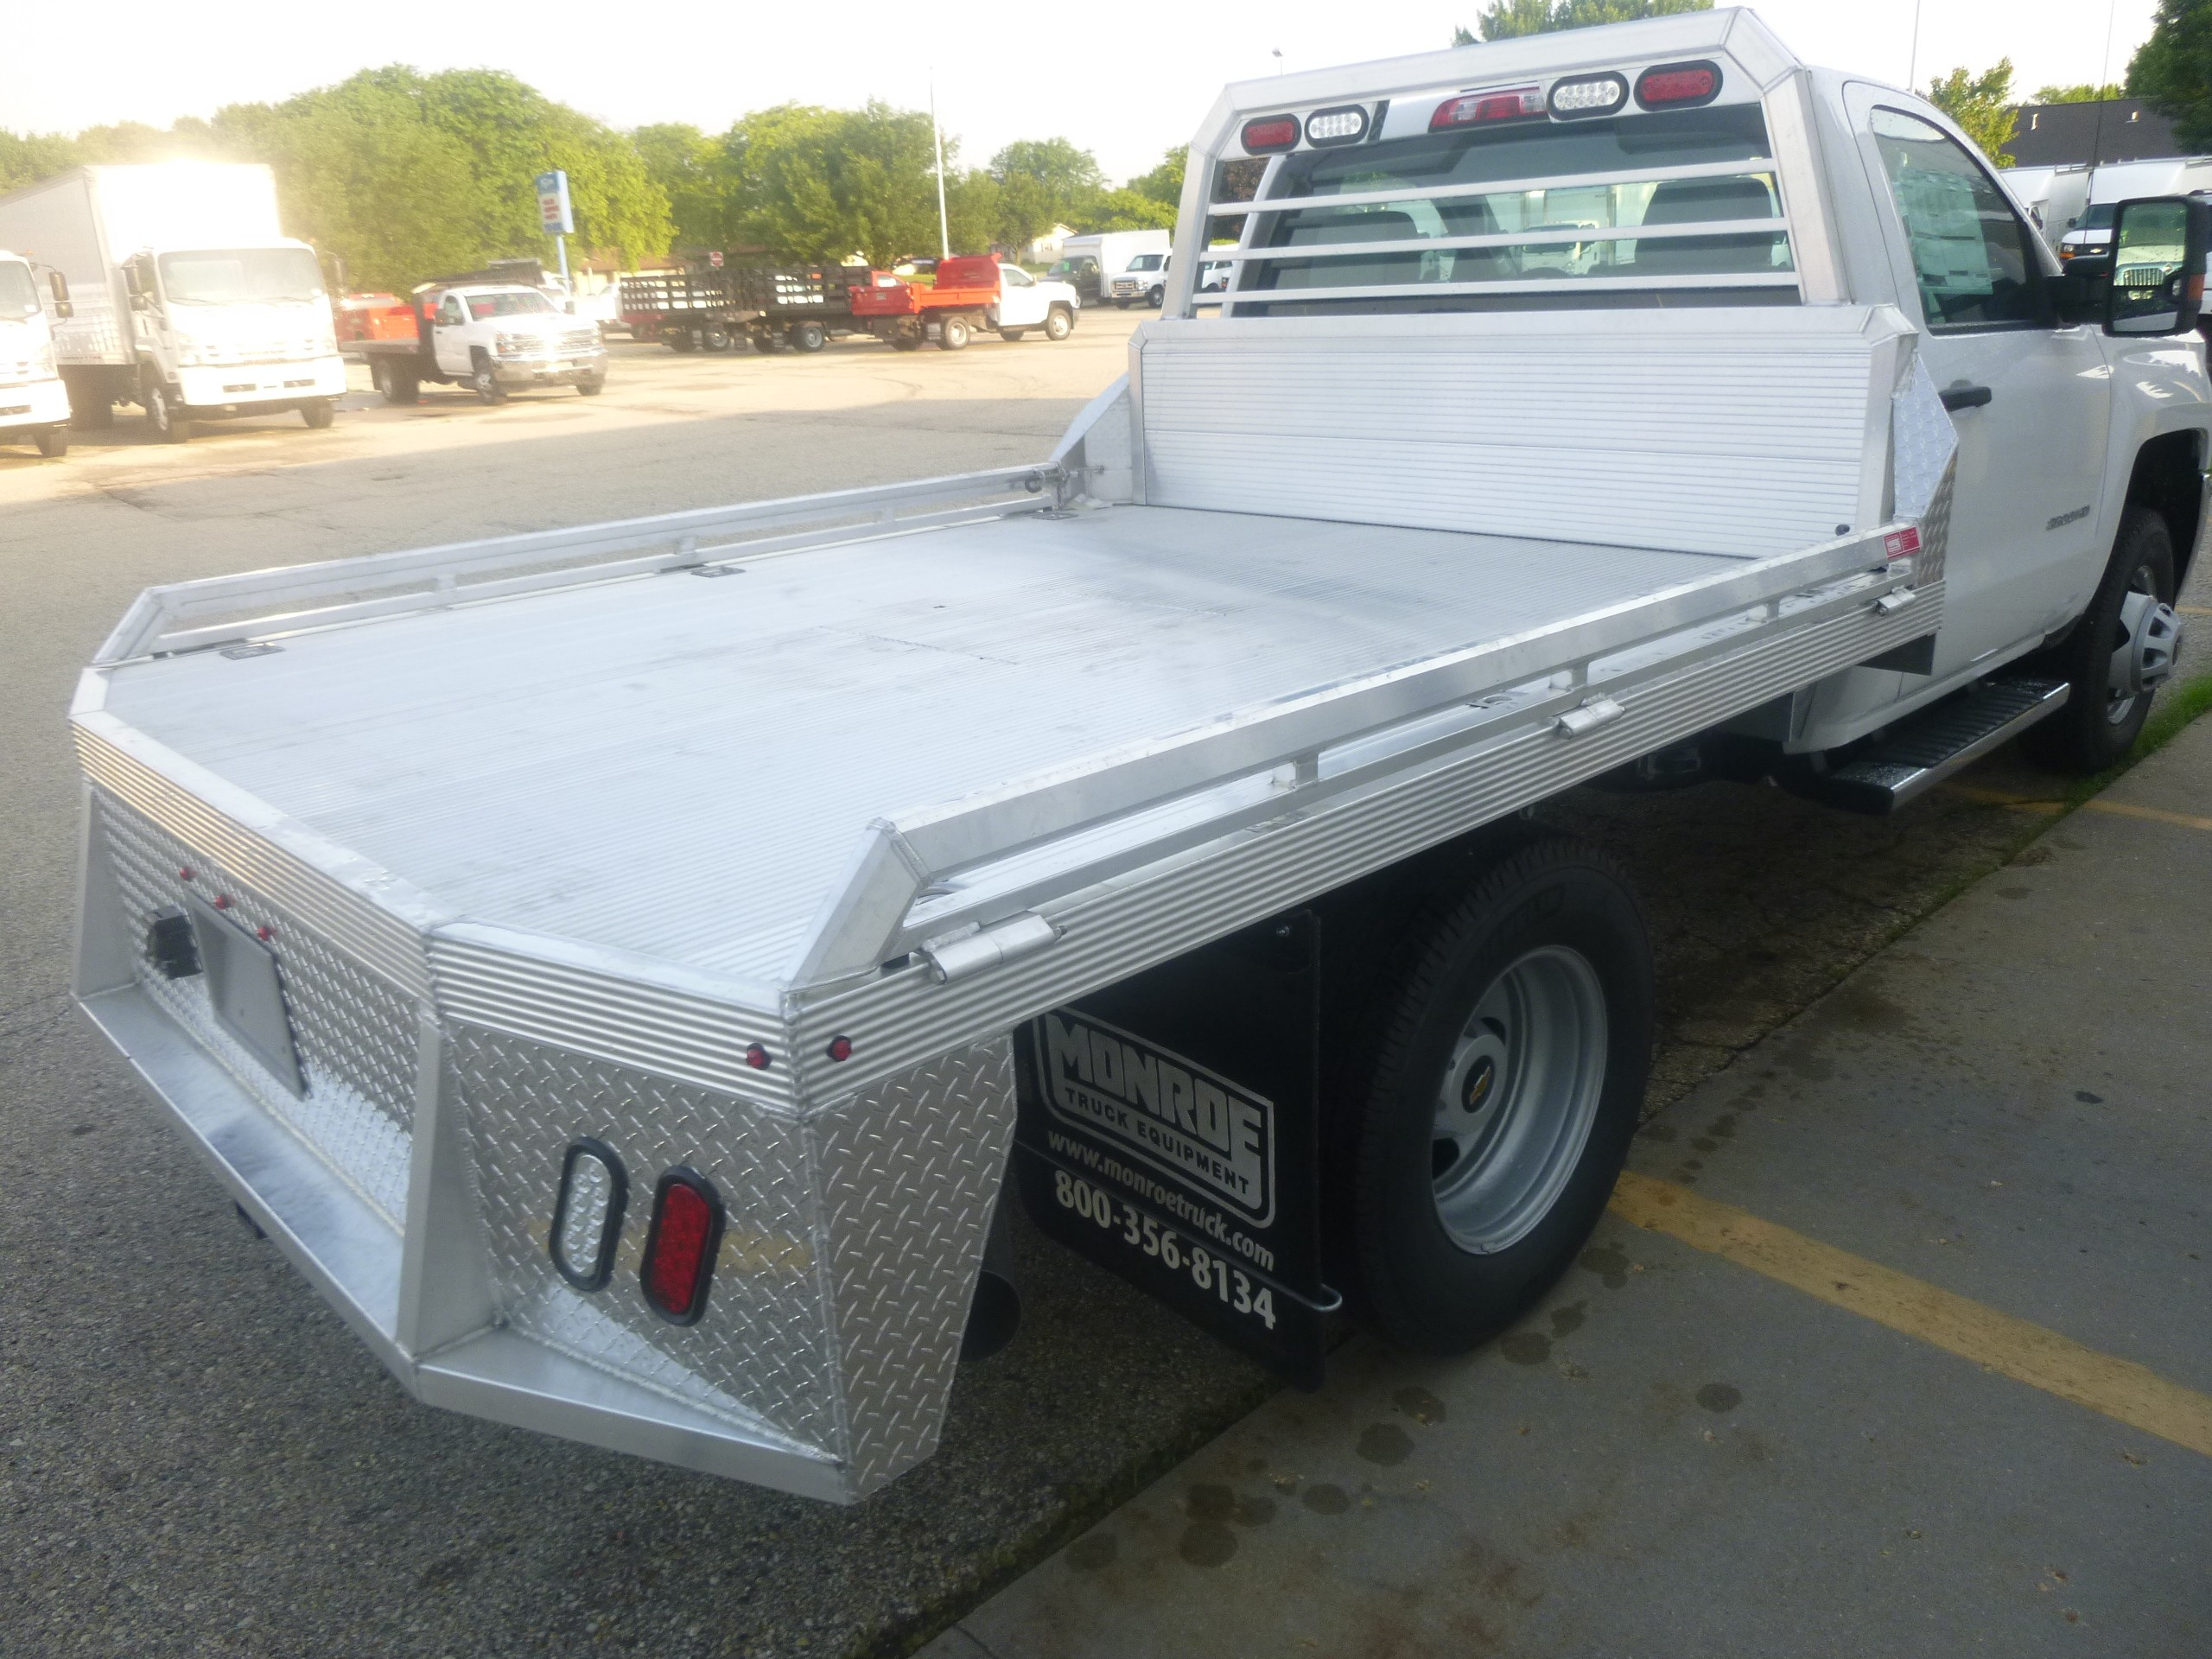 Fagan Truck Trailer Janesville Wisconsin Sells Isuzu Chevrolet 2015 Gm Pick Up Wiring 2018 Silverado 3500hd 4x4 12 Aluminum Flatbed Hauler